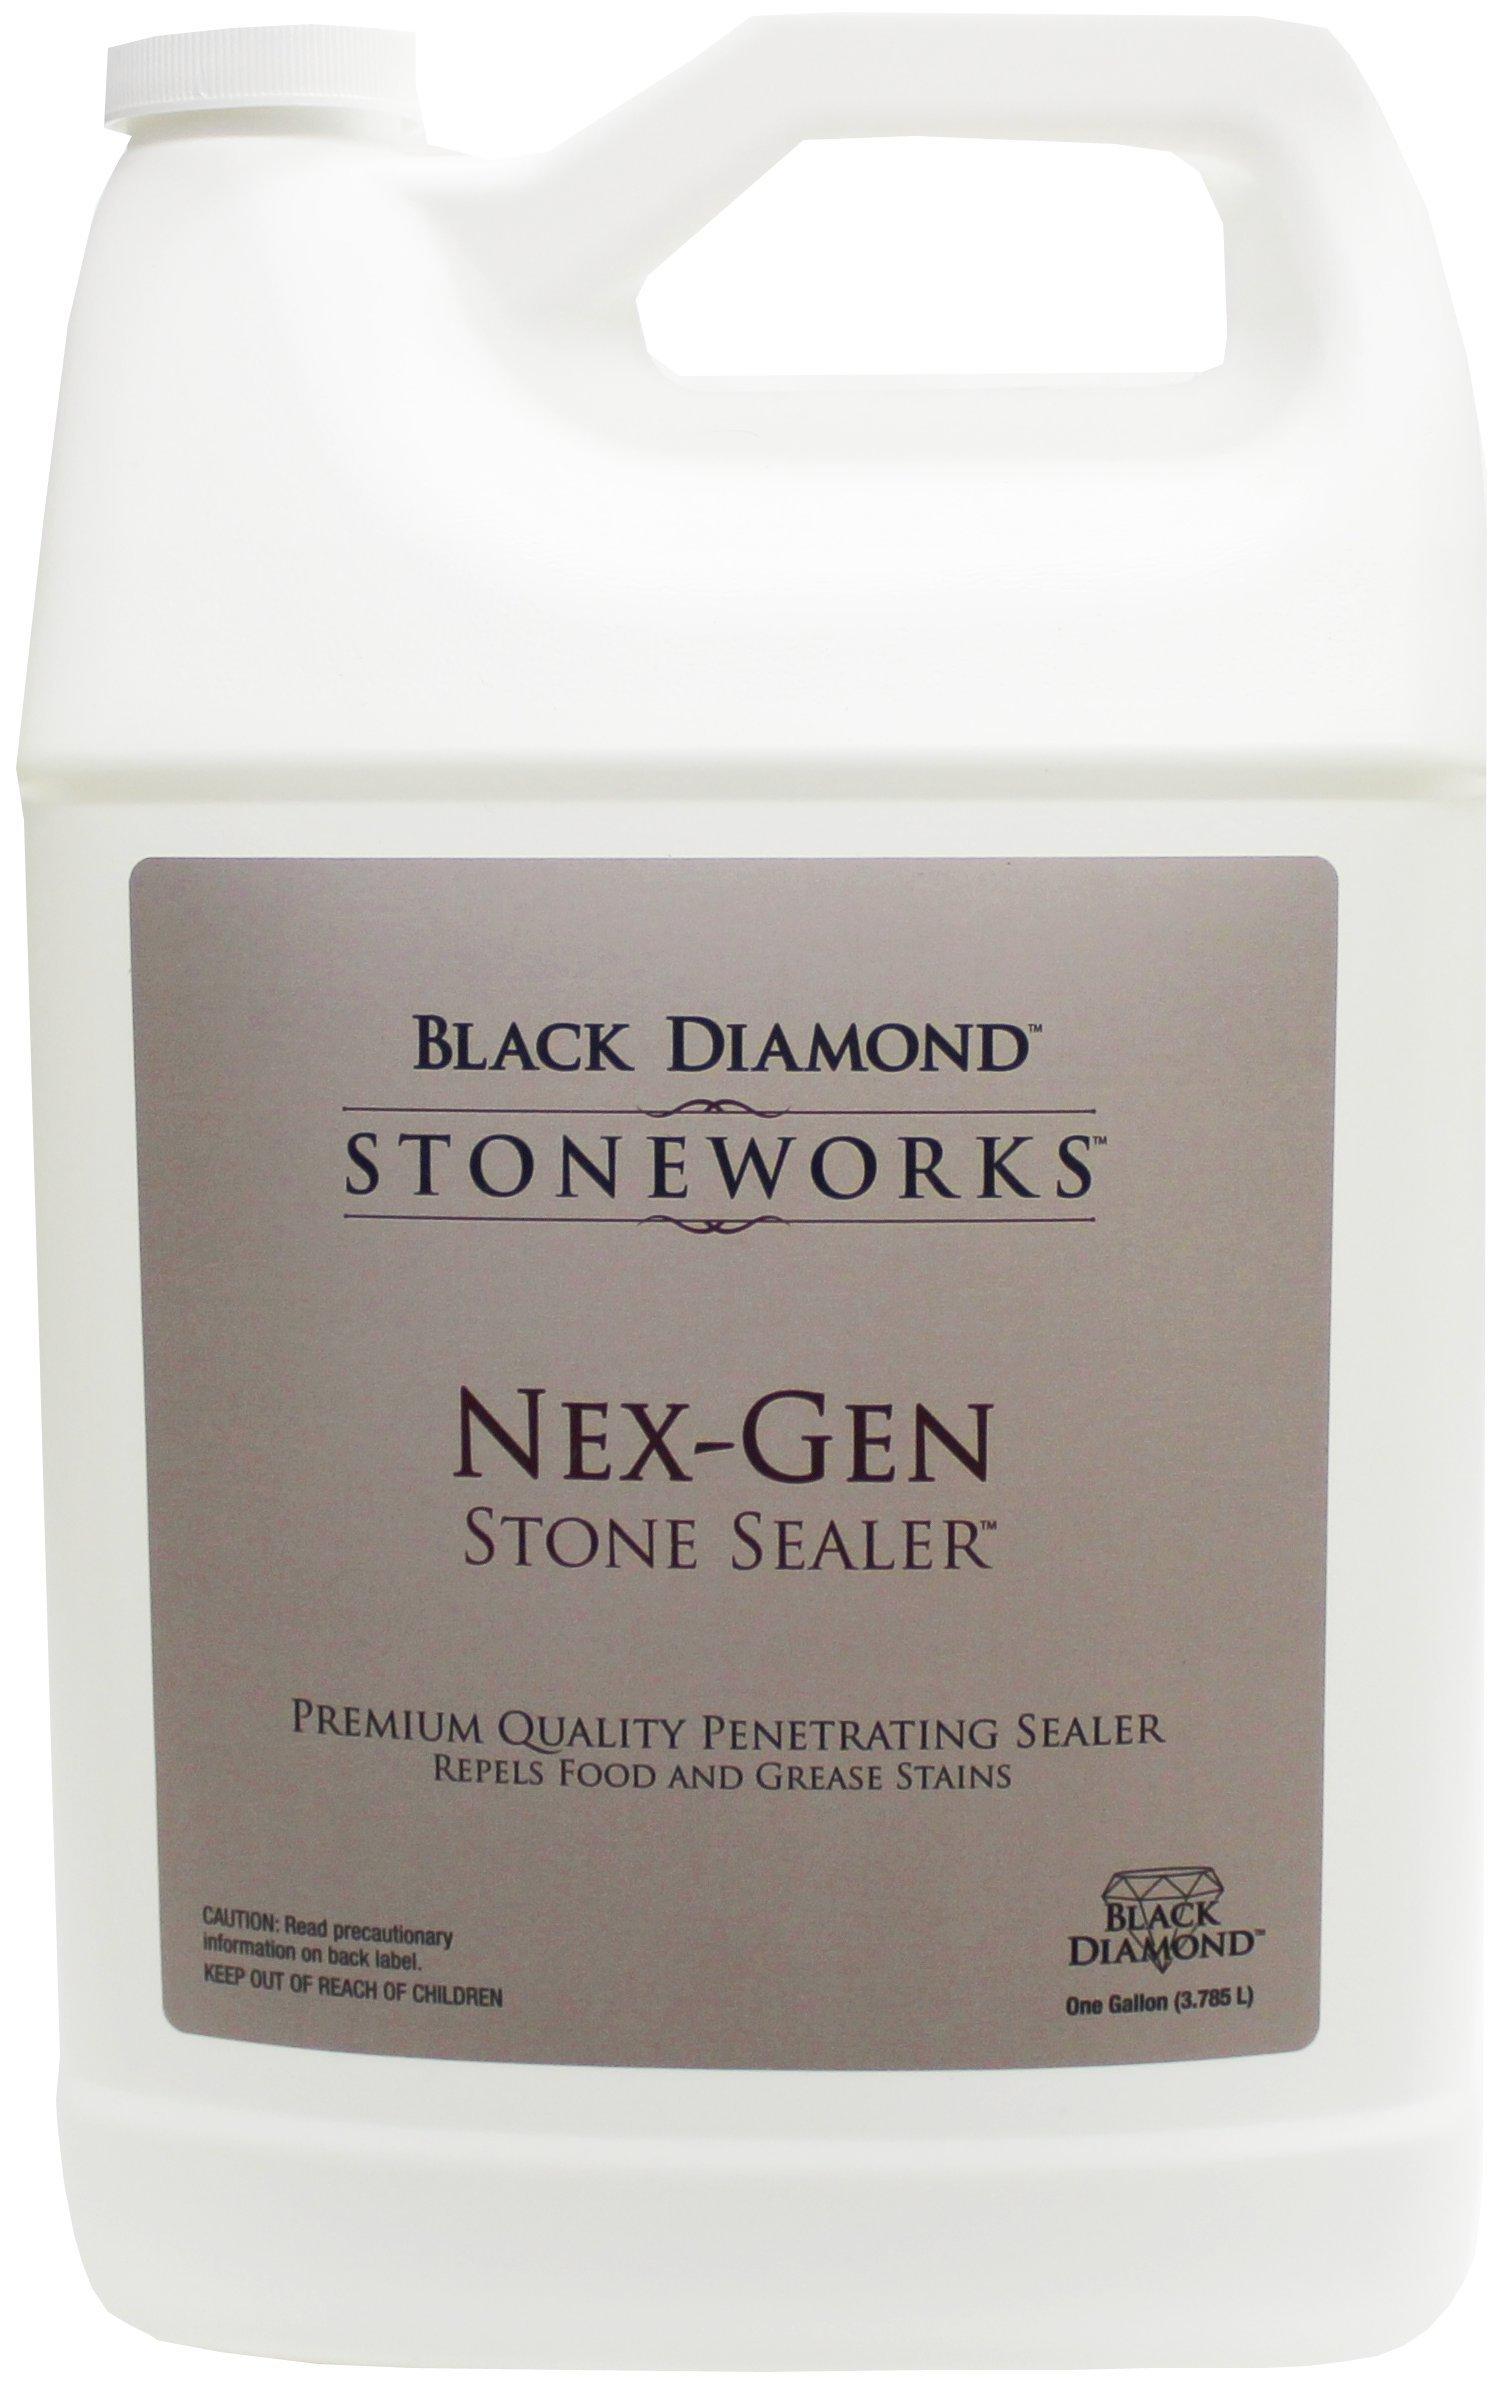 Black Diamond Stoneworks 679773003114 Nex-Gen Stone Sealer Penetrating Sealer, Seals and Protects Granite, Marble, Travertine, Limestone, Grout, Tile, Brick and Slate, 1- Gallon